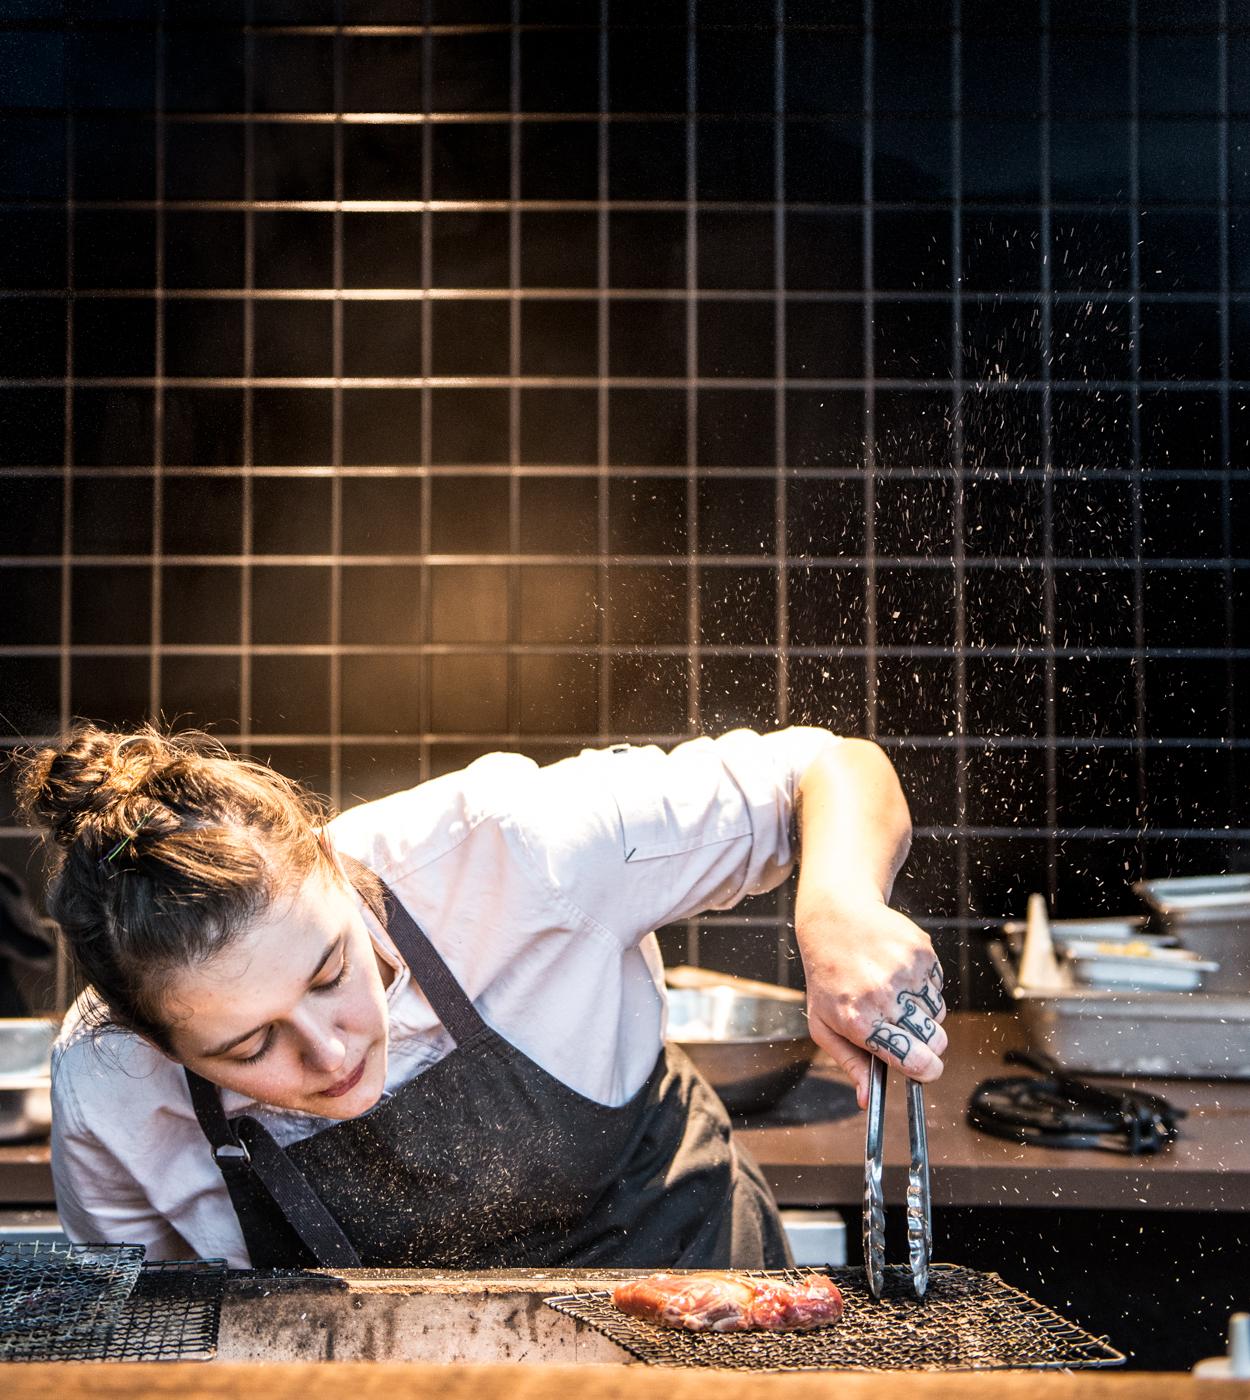 2 Sarah Flotard, Chef, Female, Grill.jpg